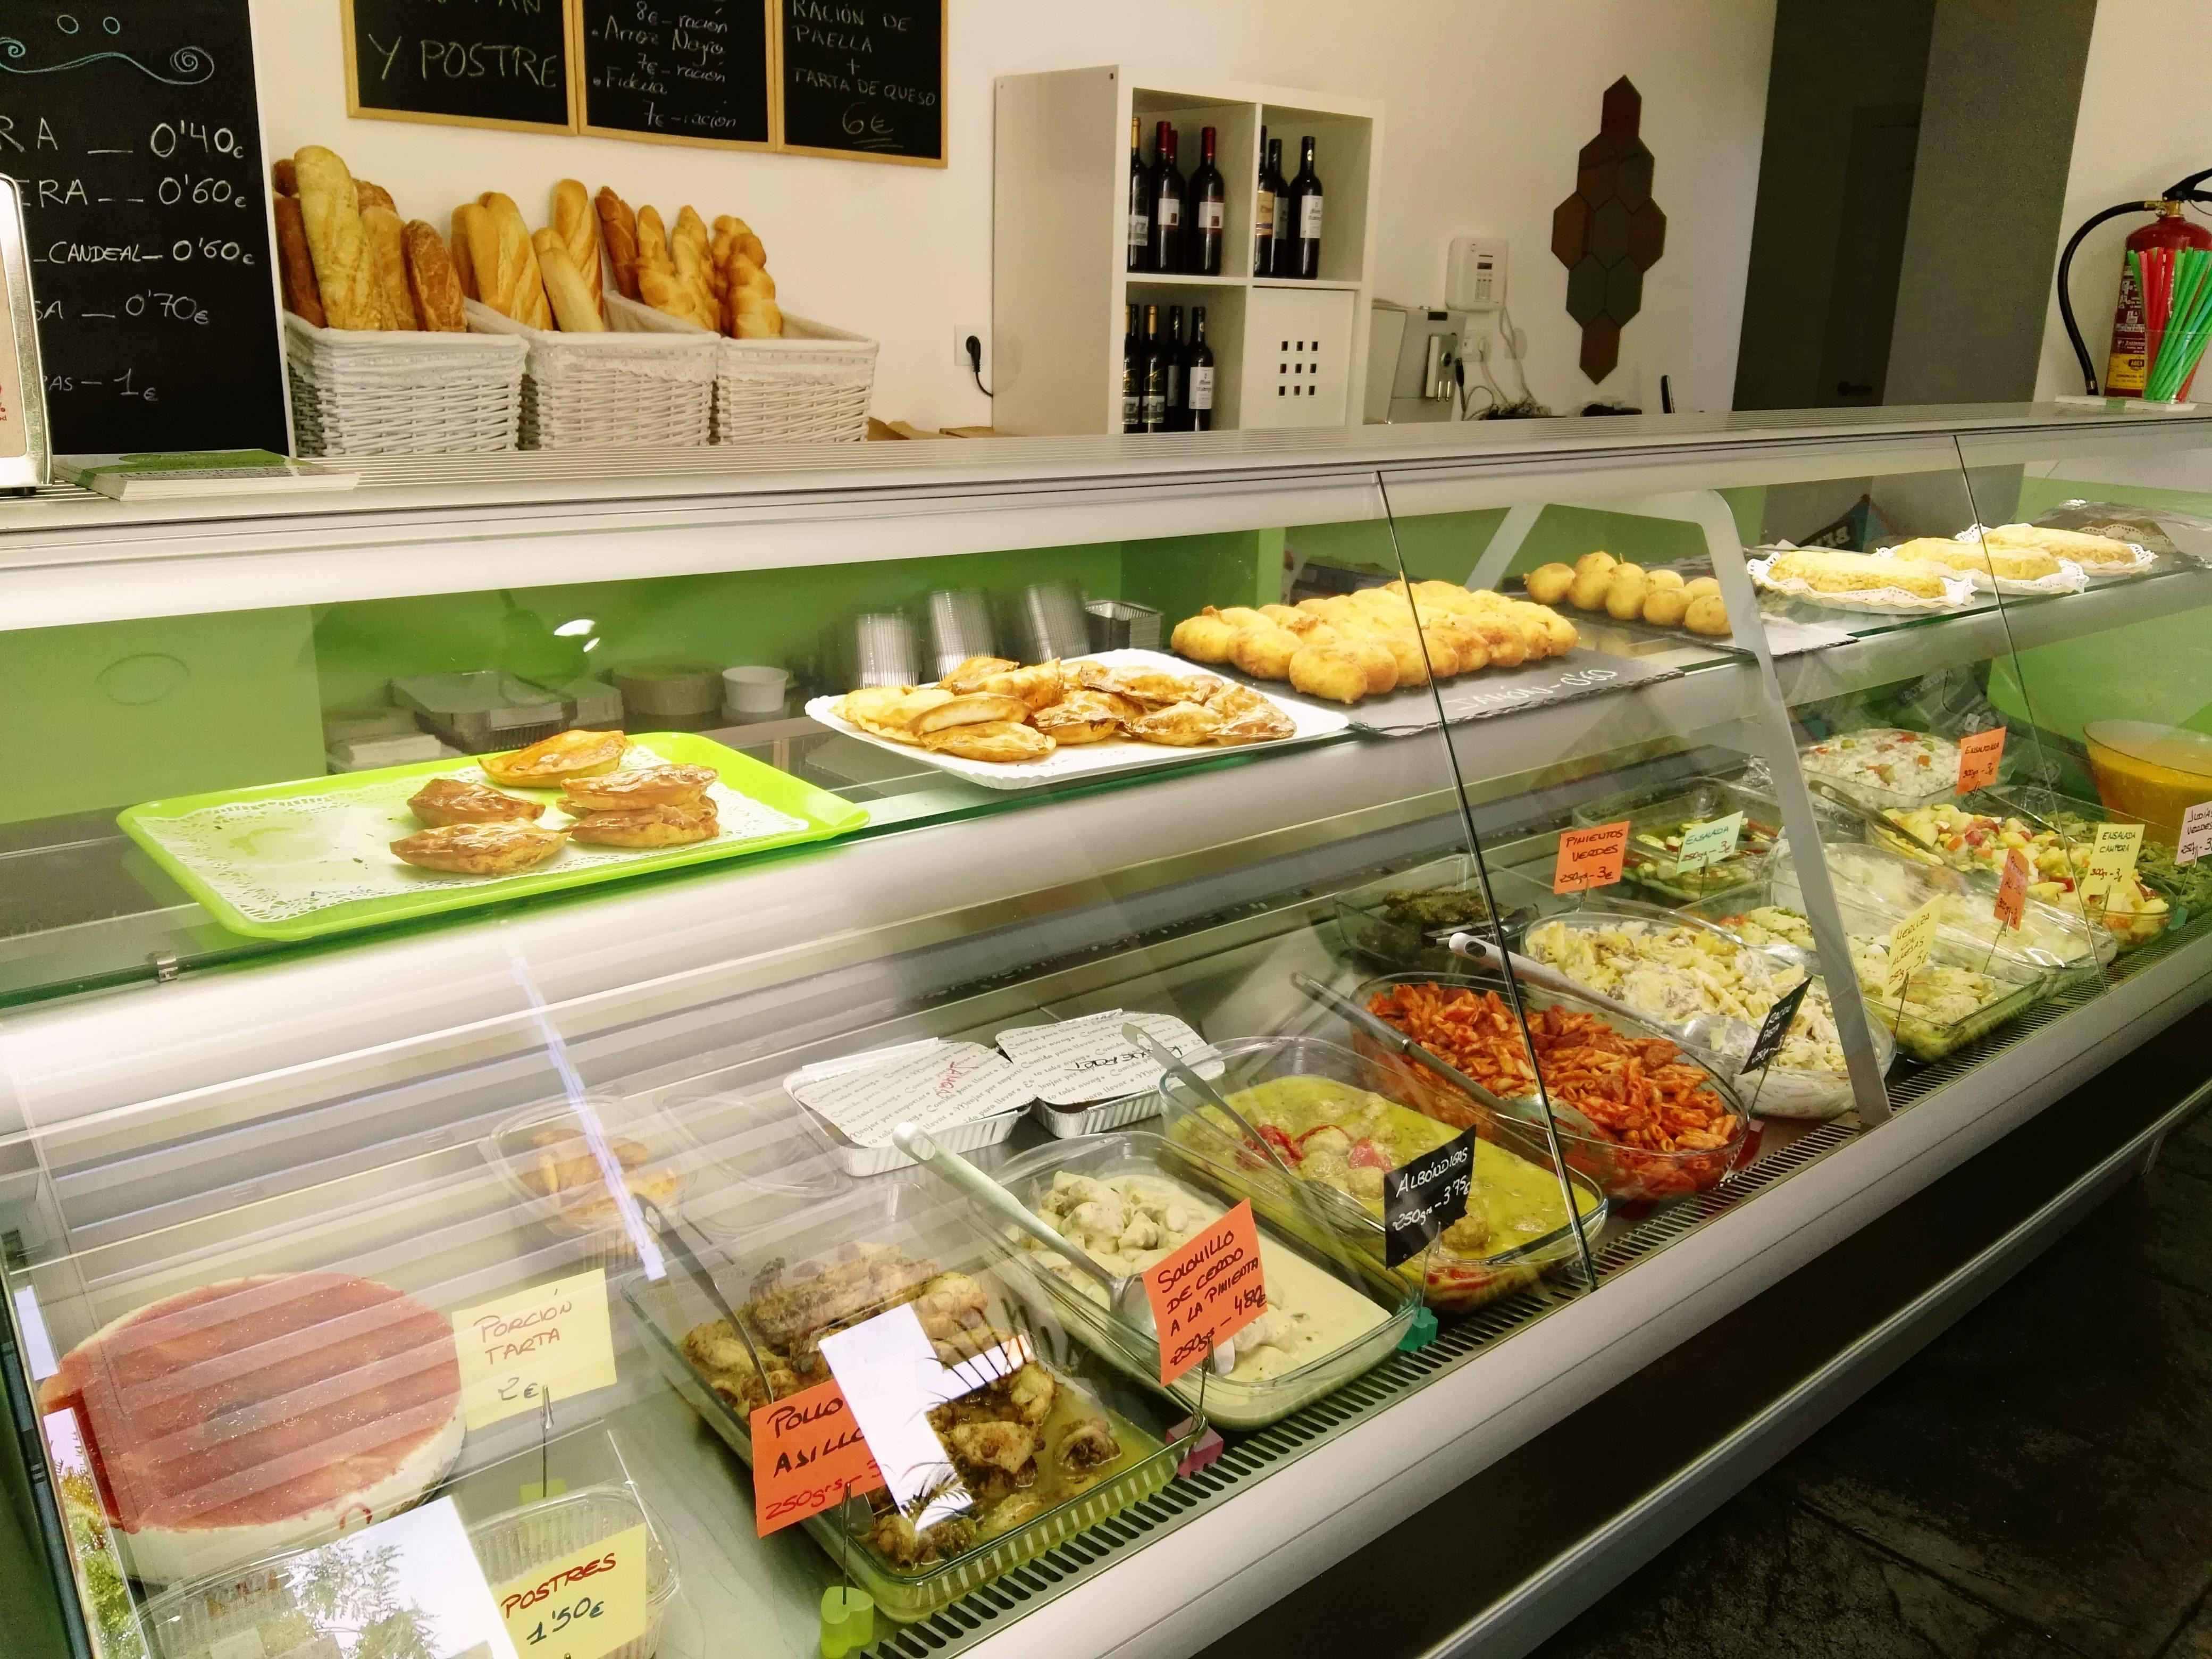 Tu puchero comida casera para llevar Menu comida casera